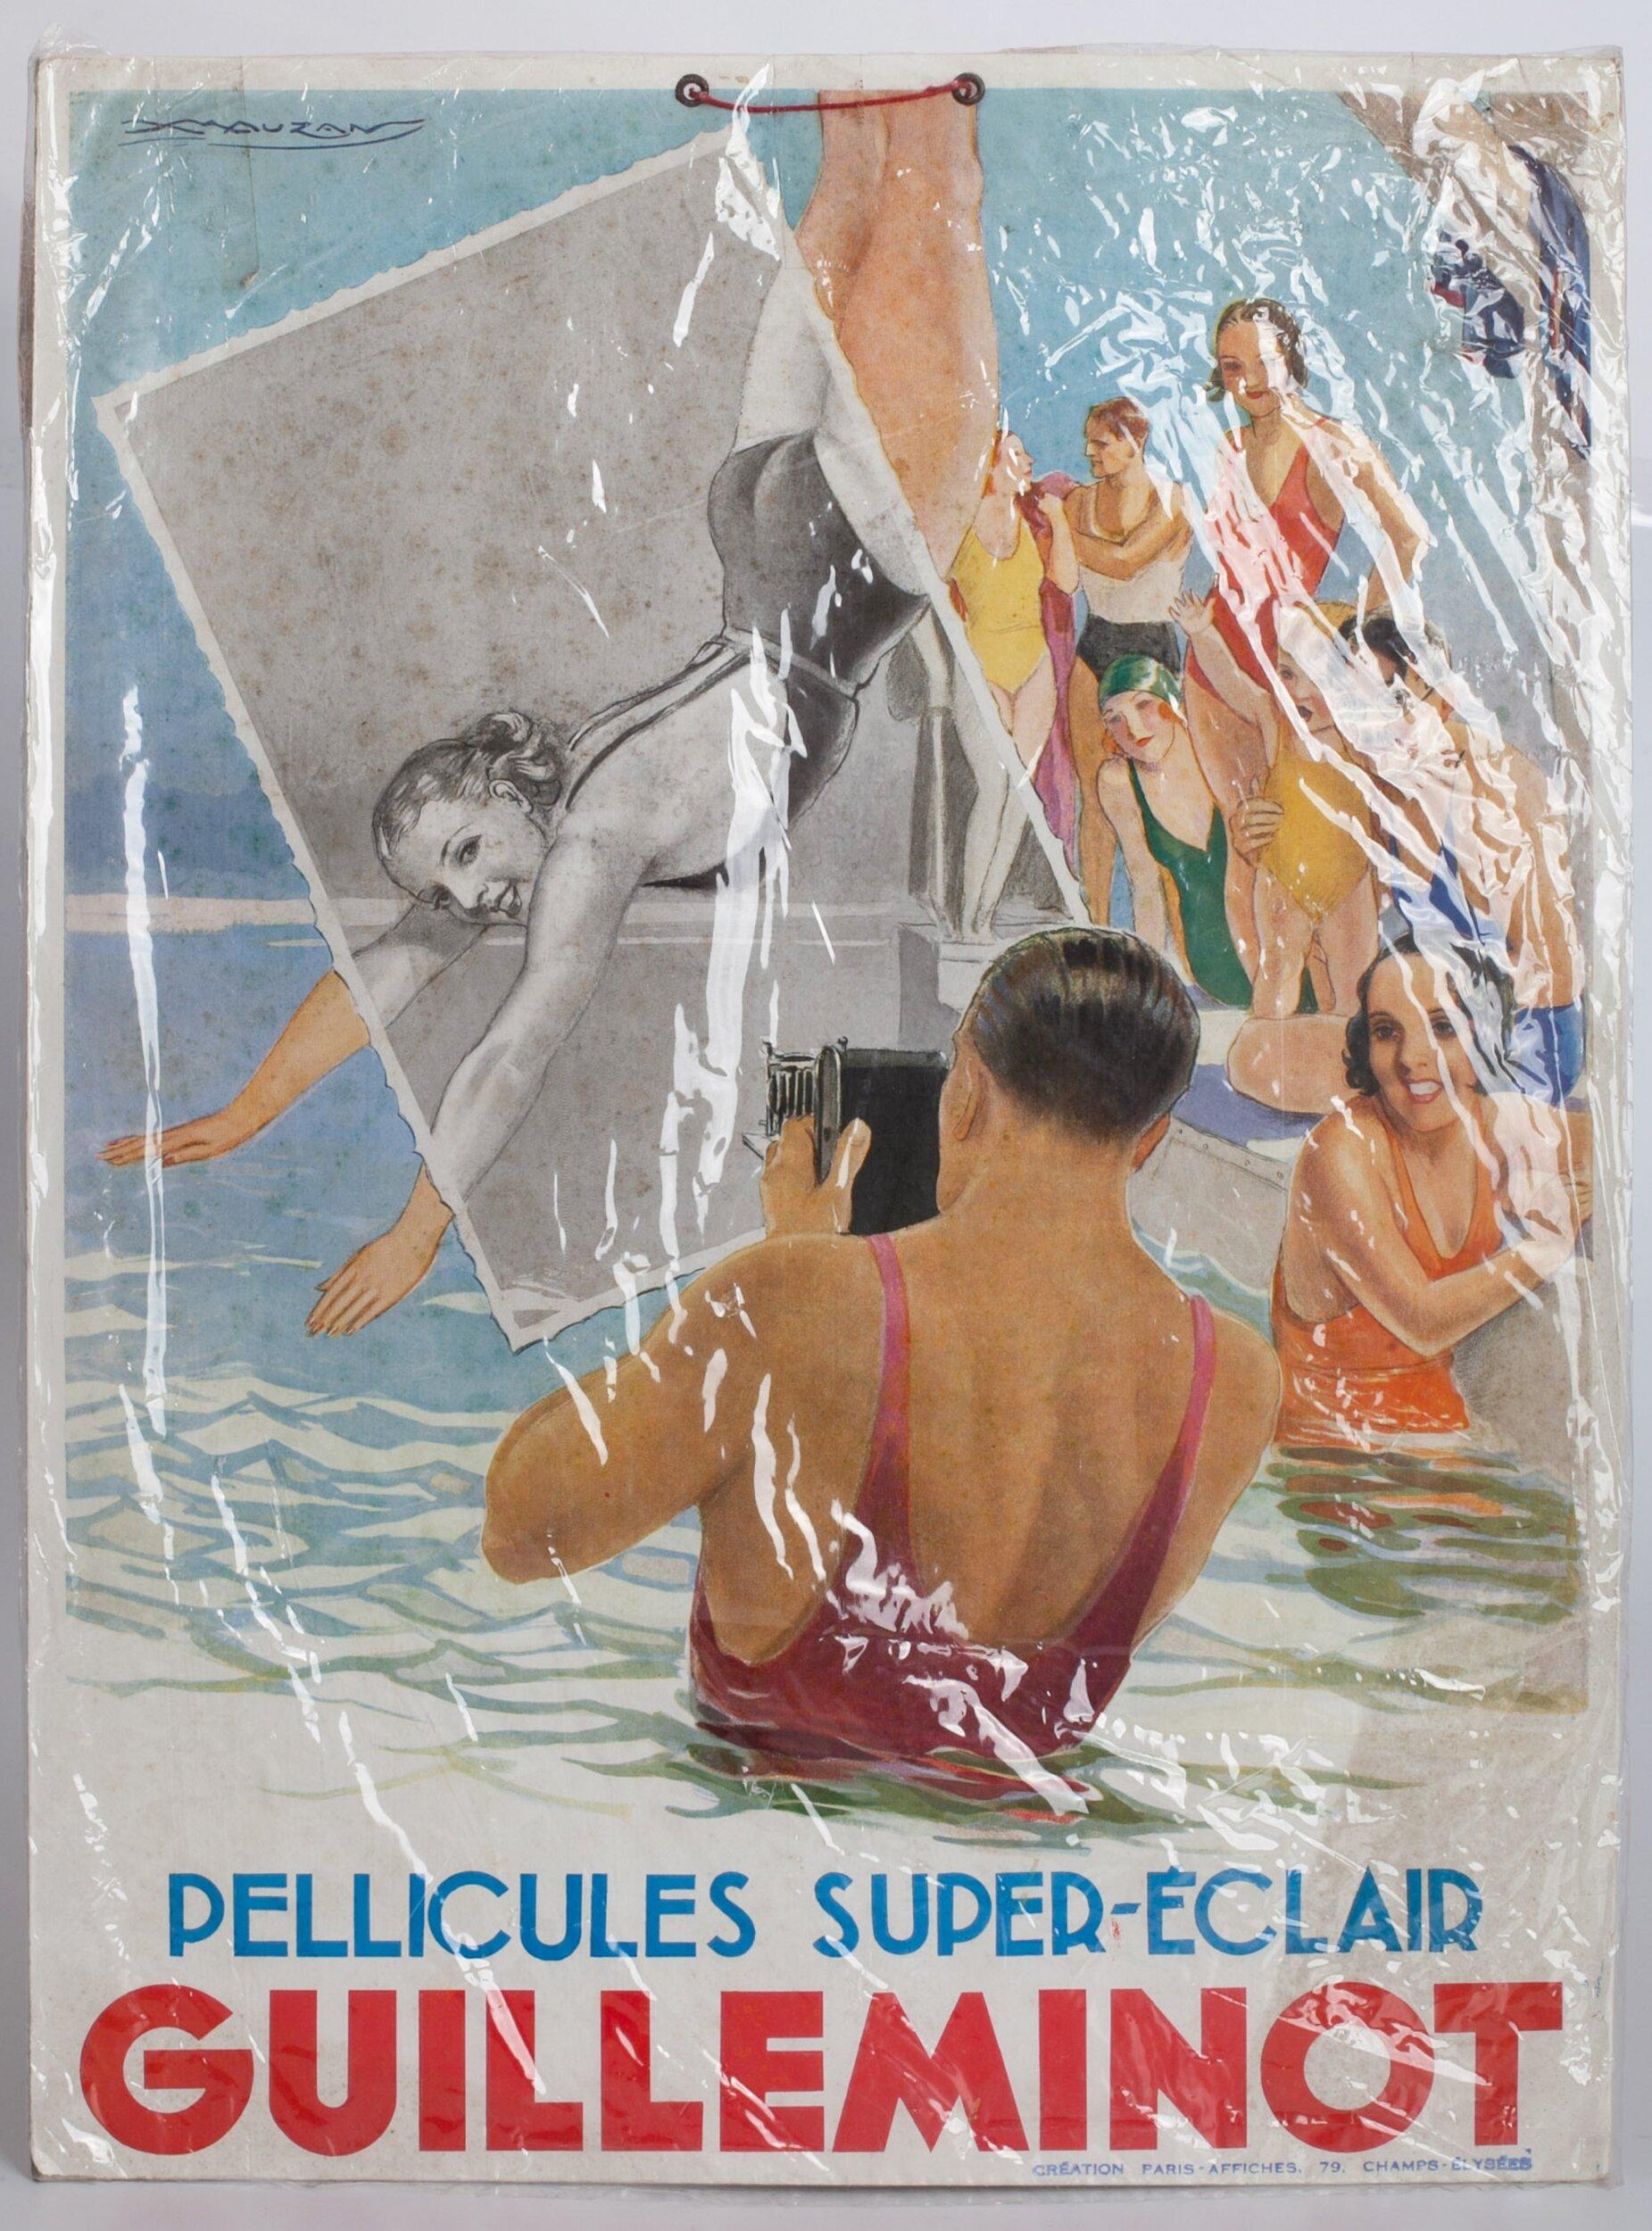 Pellicules Super-Eclair Gaullemont  Werbeschild 34,5x46cm